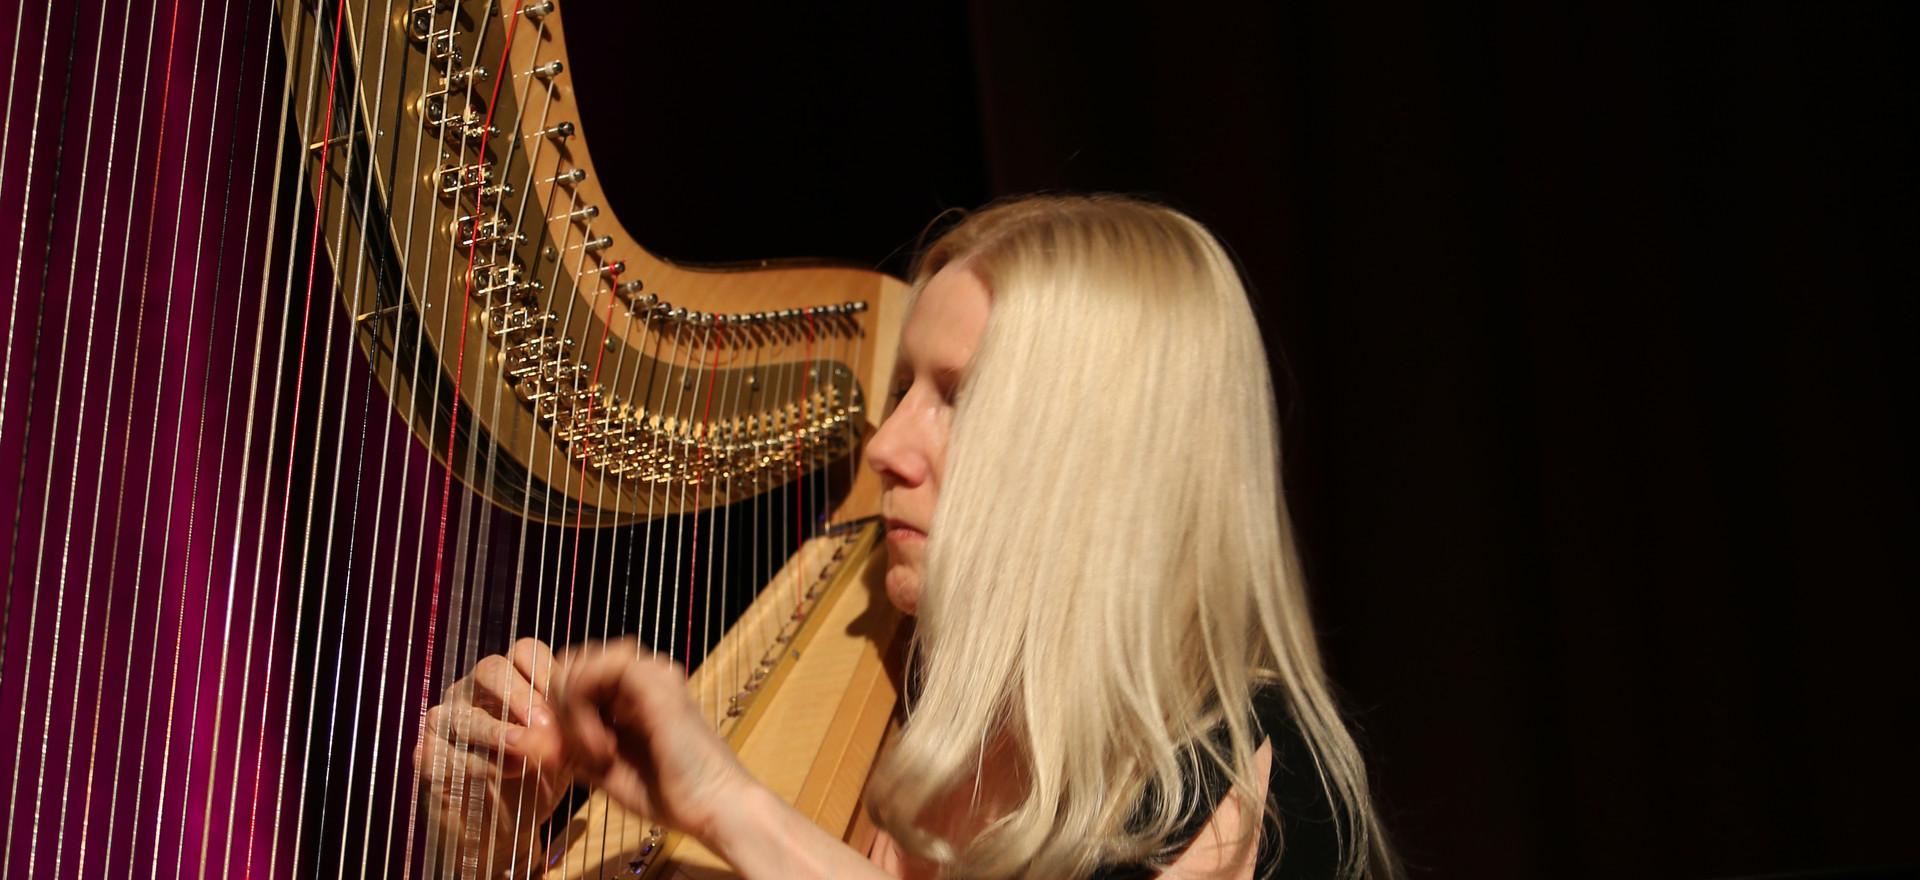 Evelyn Huber